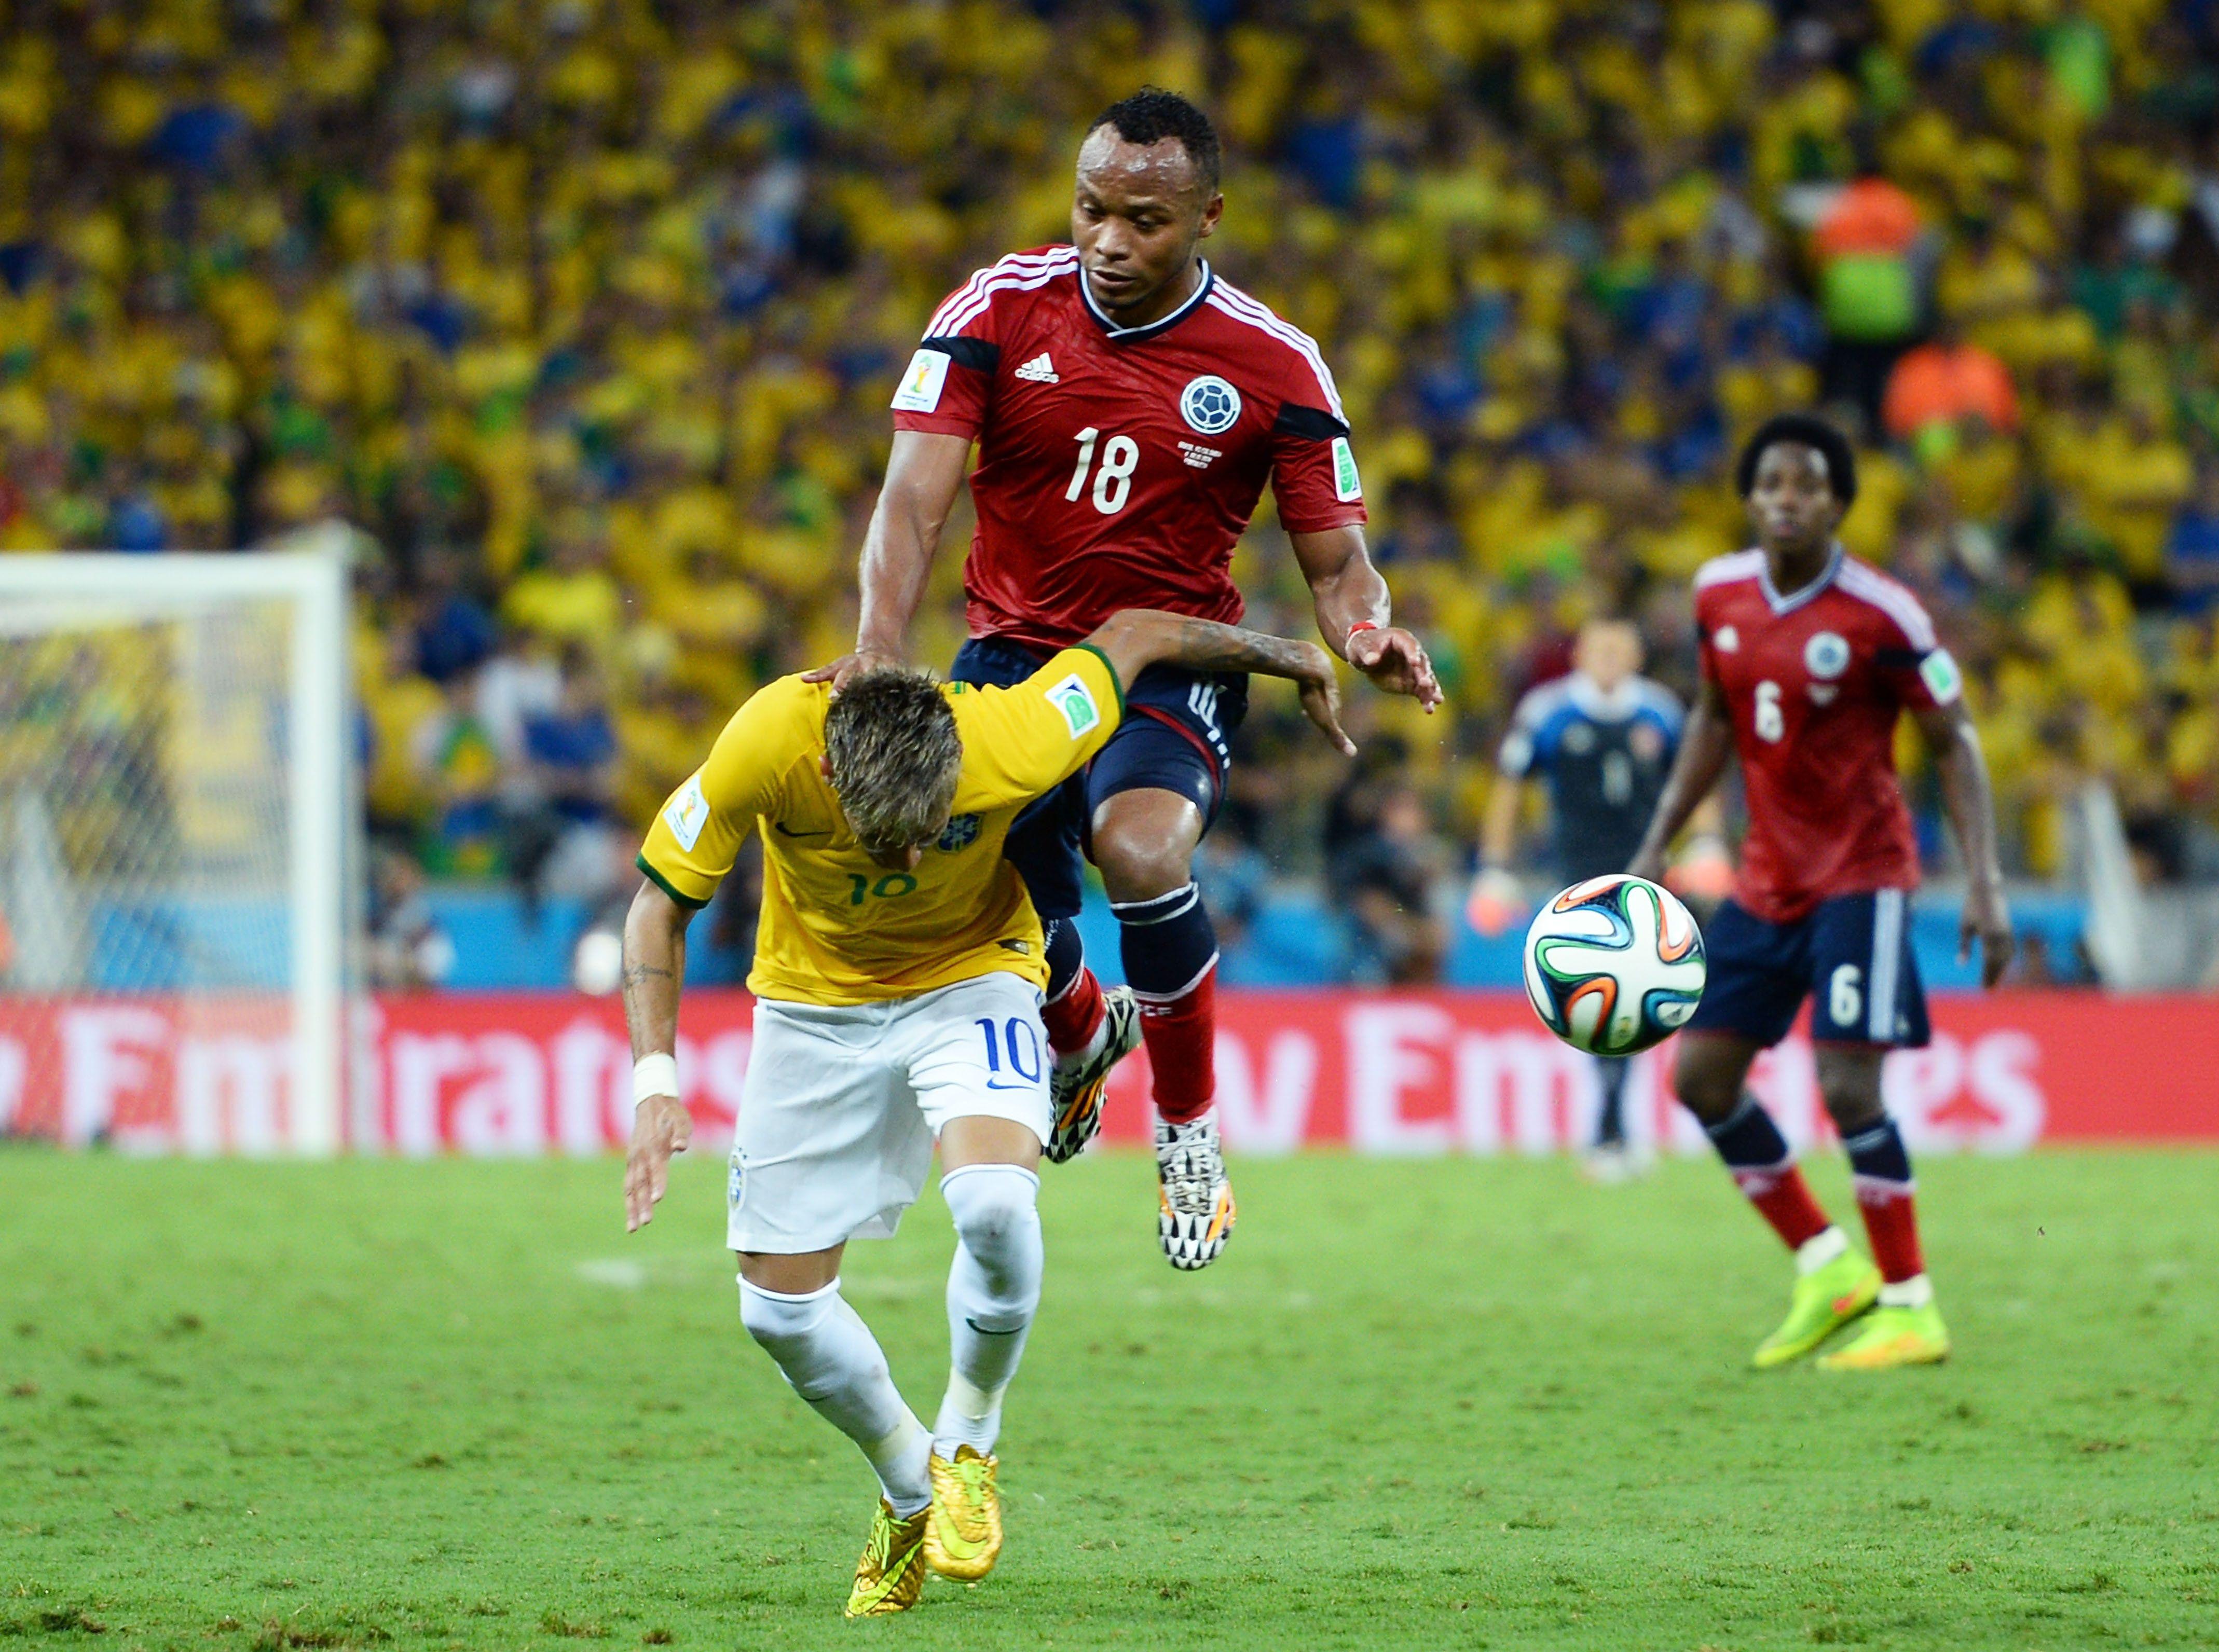 2014 World Cup Neymar Out Of Tournament Ith Fractured Vertebra Neymar World Cup Soccer World